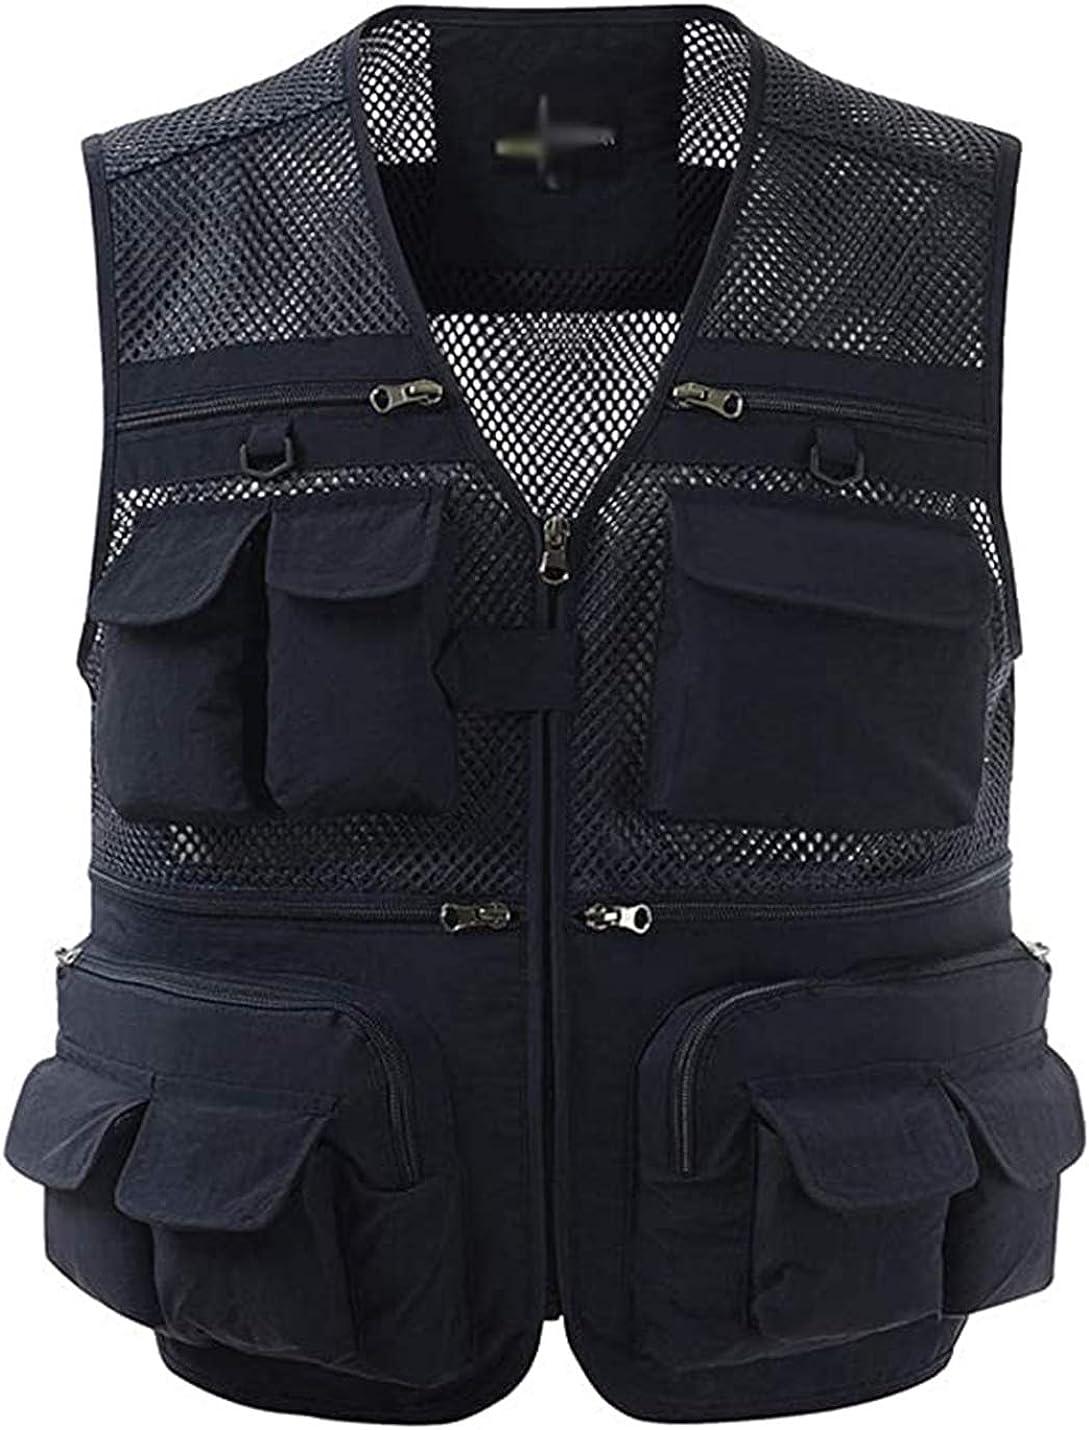 PEHMEA Mens Mesh Outdoor Work Safari Fishing Travel Photo Cargo Vest Multi Pockets Breathable Waistcoat Jacket